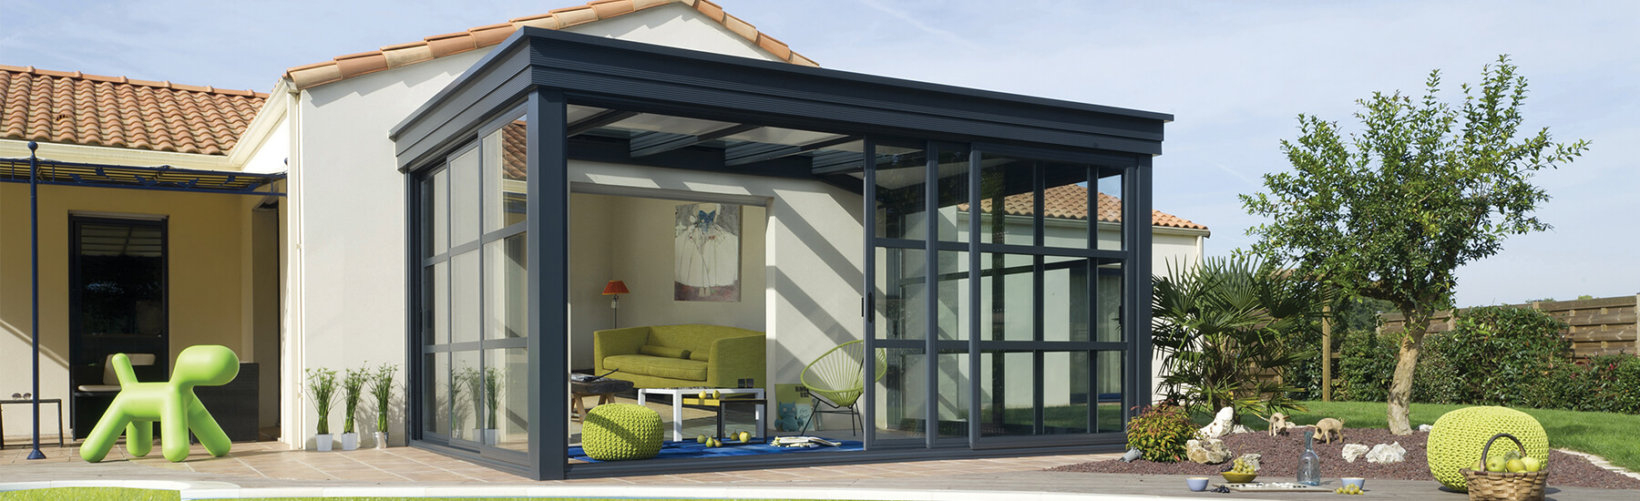 Véranda Contemporaine Homéa : Véranda Moderne, Design En Alu ... pour Pergola Toit Plat